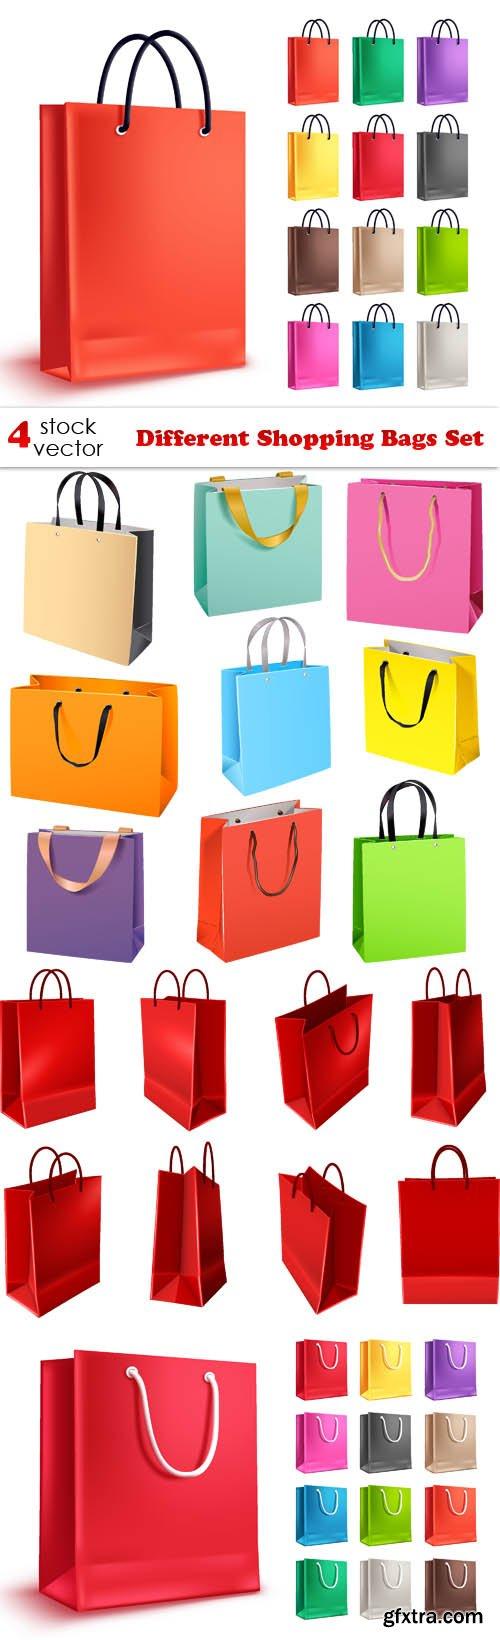 Vectors - Different Shopping Bags Set